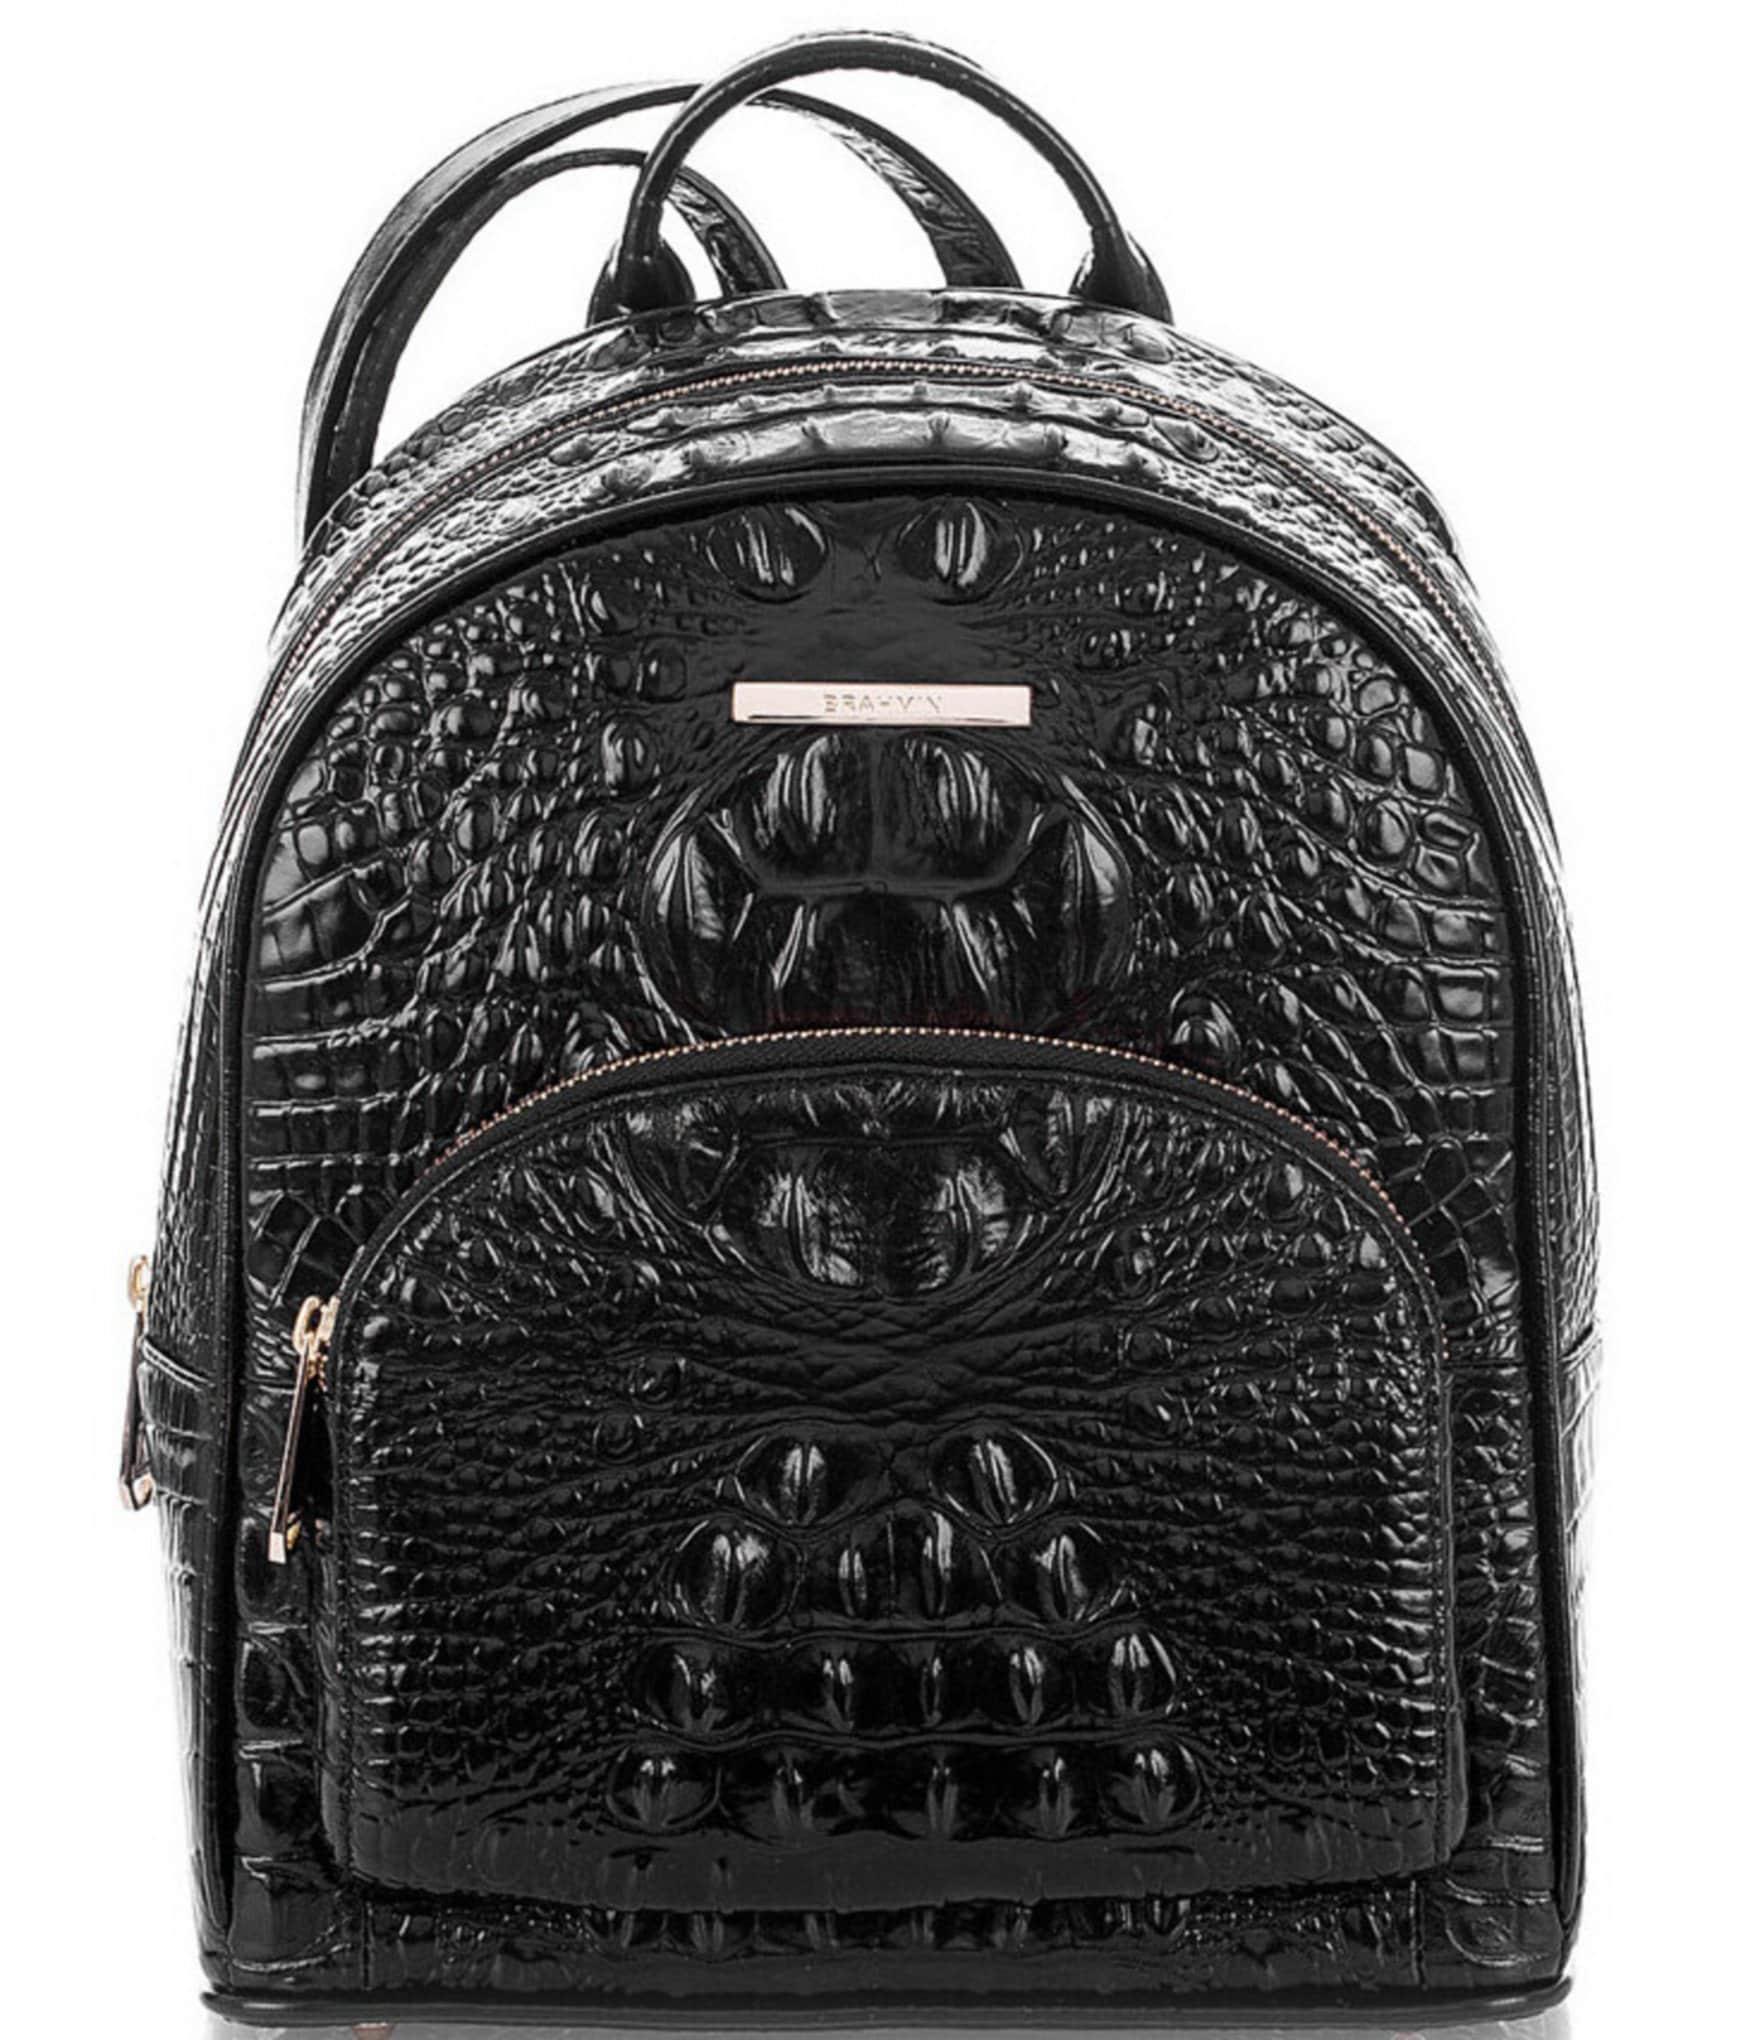 065e97e8915c16 Black Backpacks | Dillard's